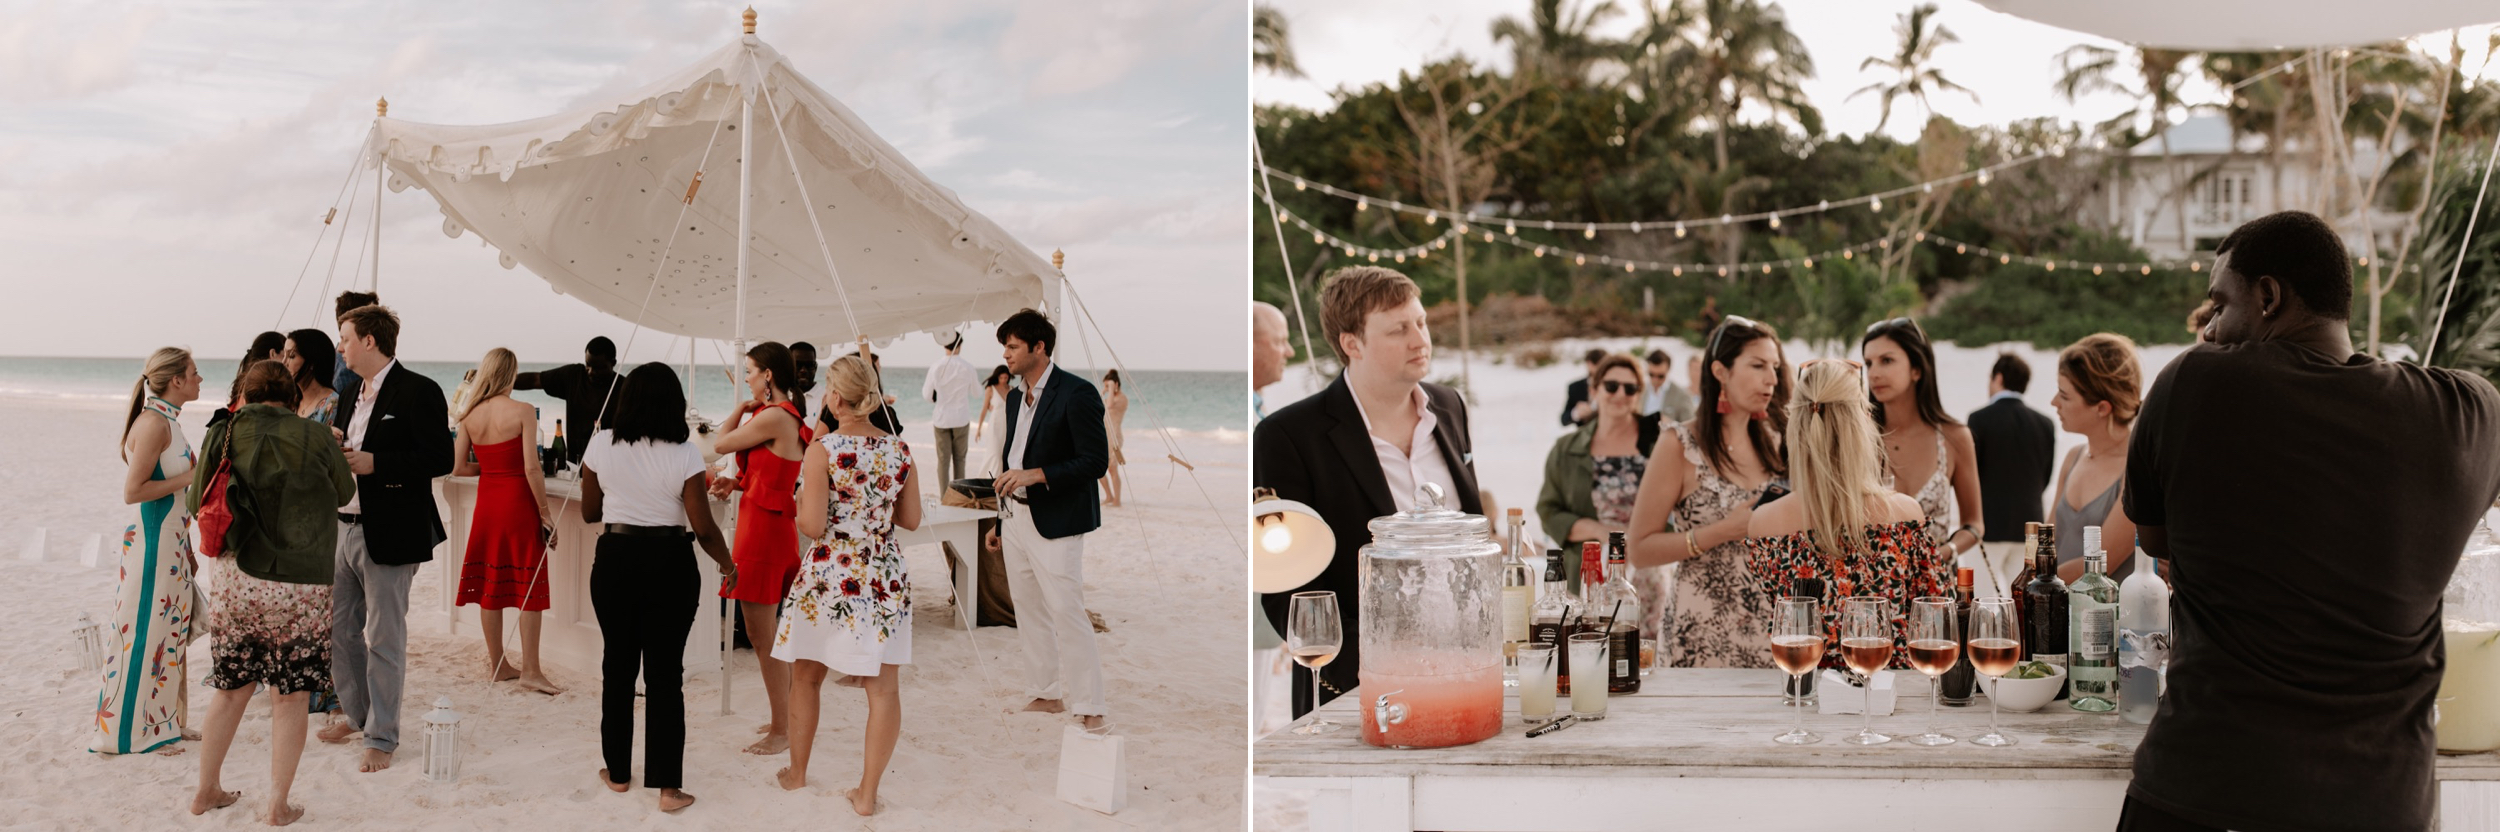 Harbour-Island-Ocean-View-Club-Wedding-Photographer_69.jpg